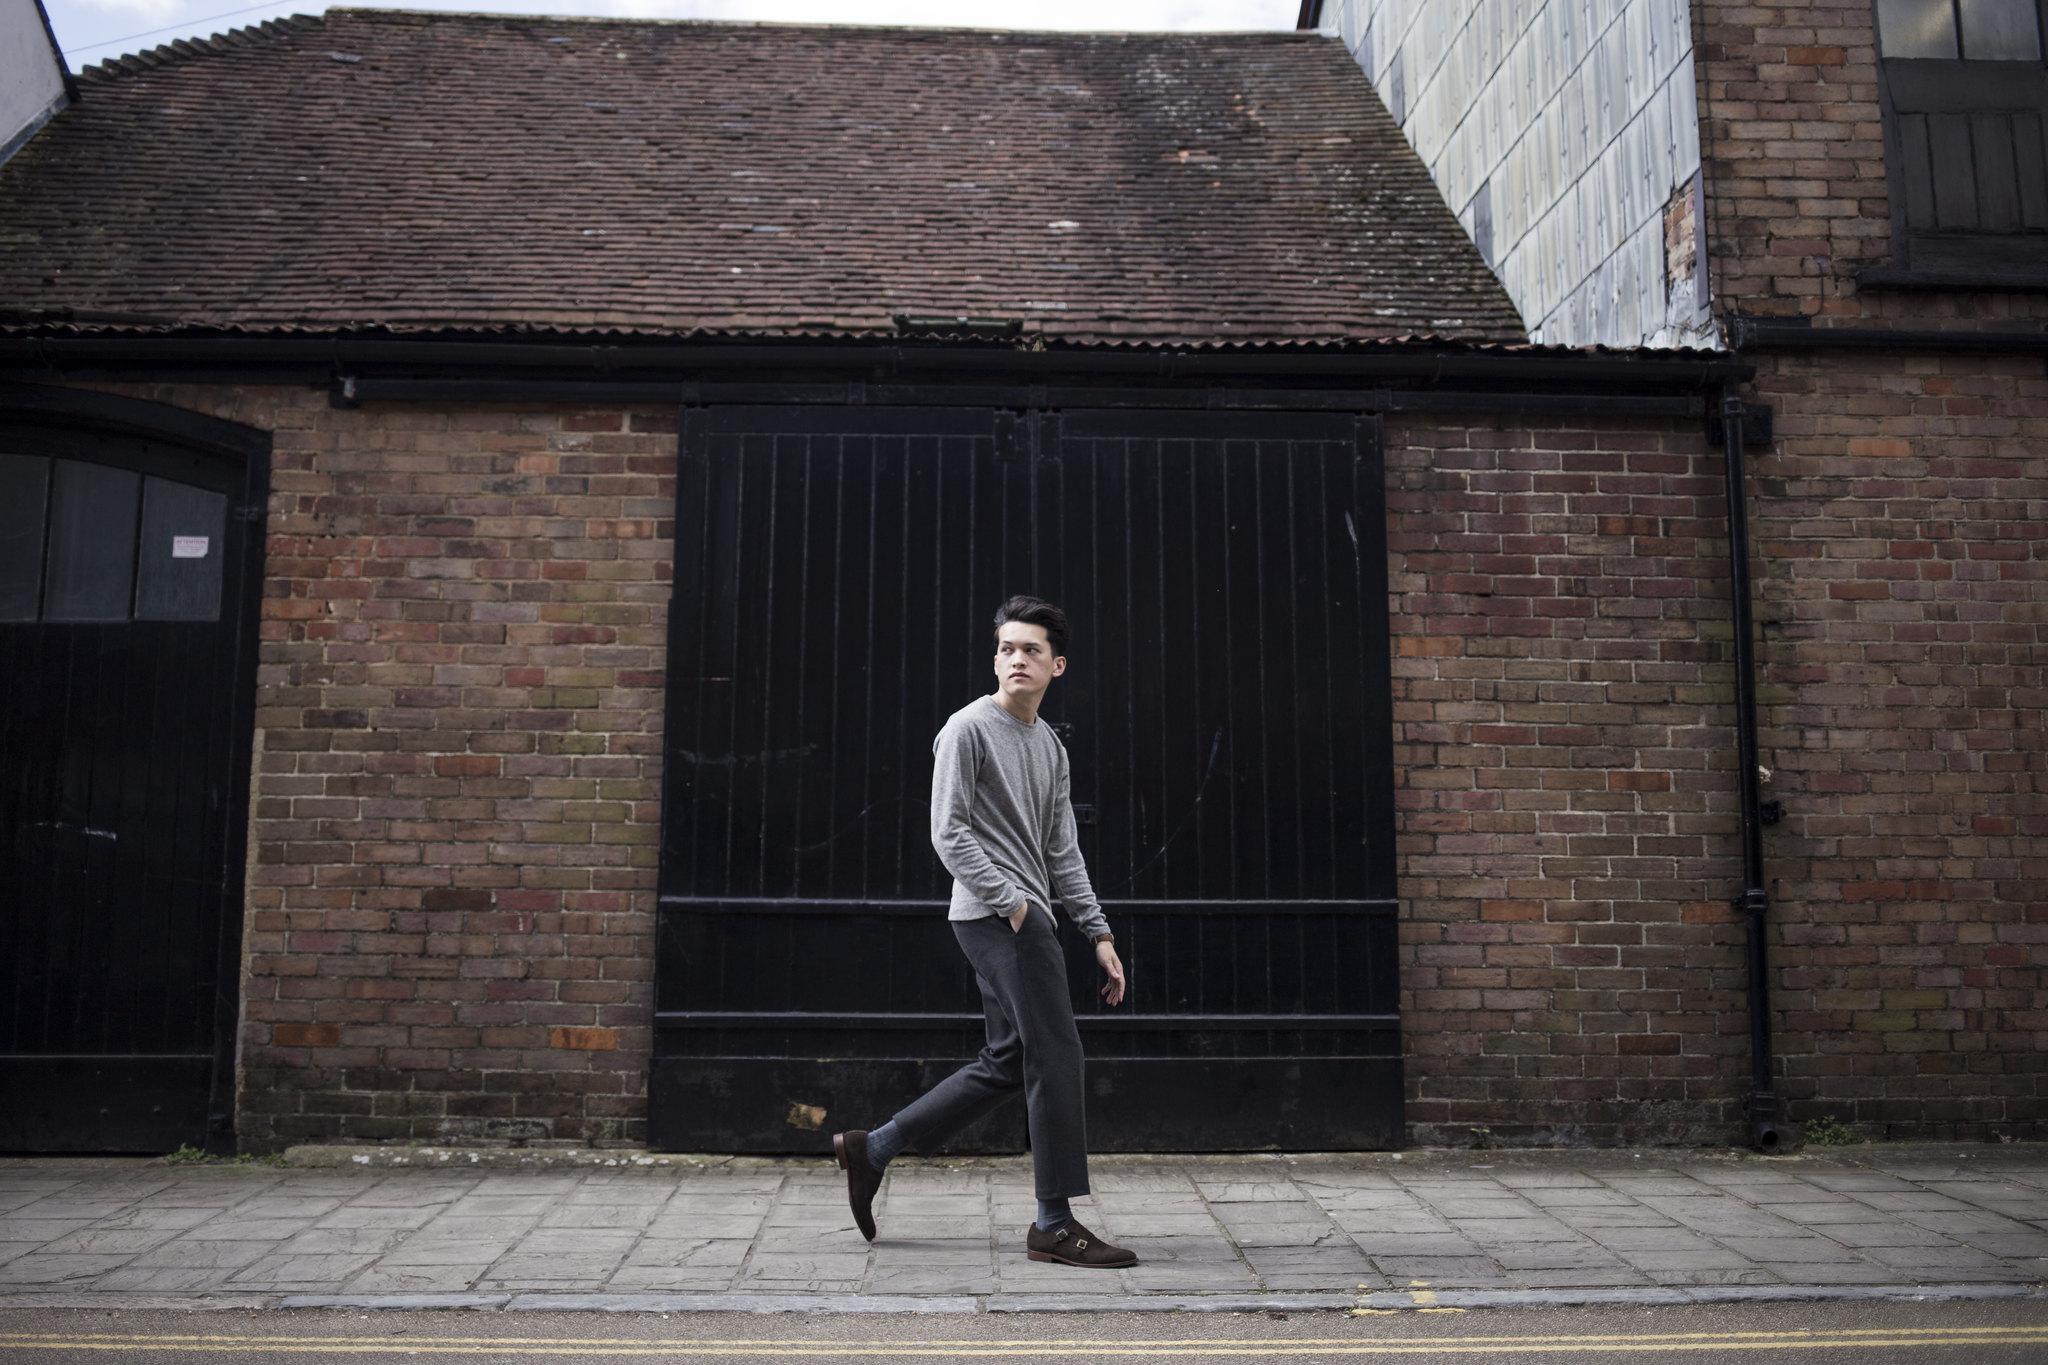 Jordan_Bunker_dune_london_11